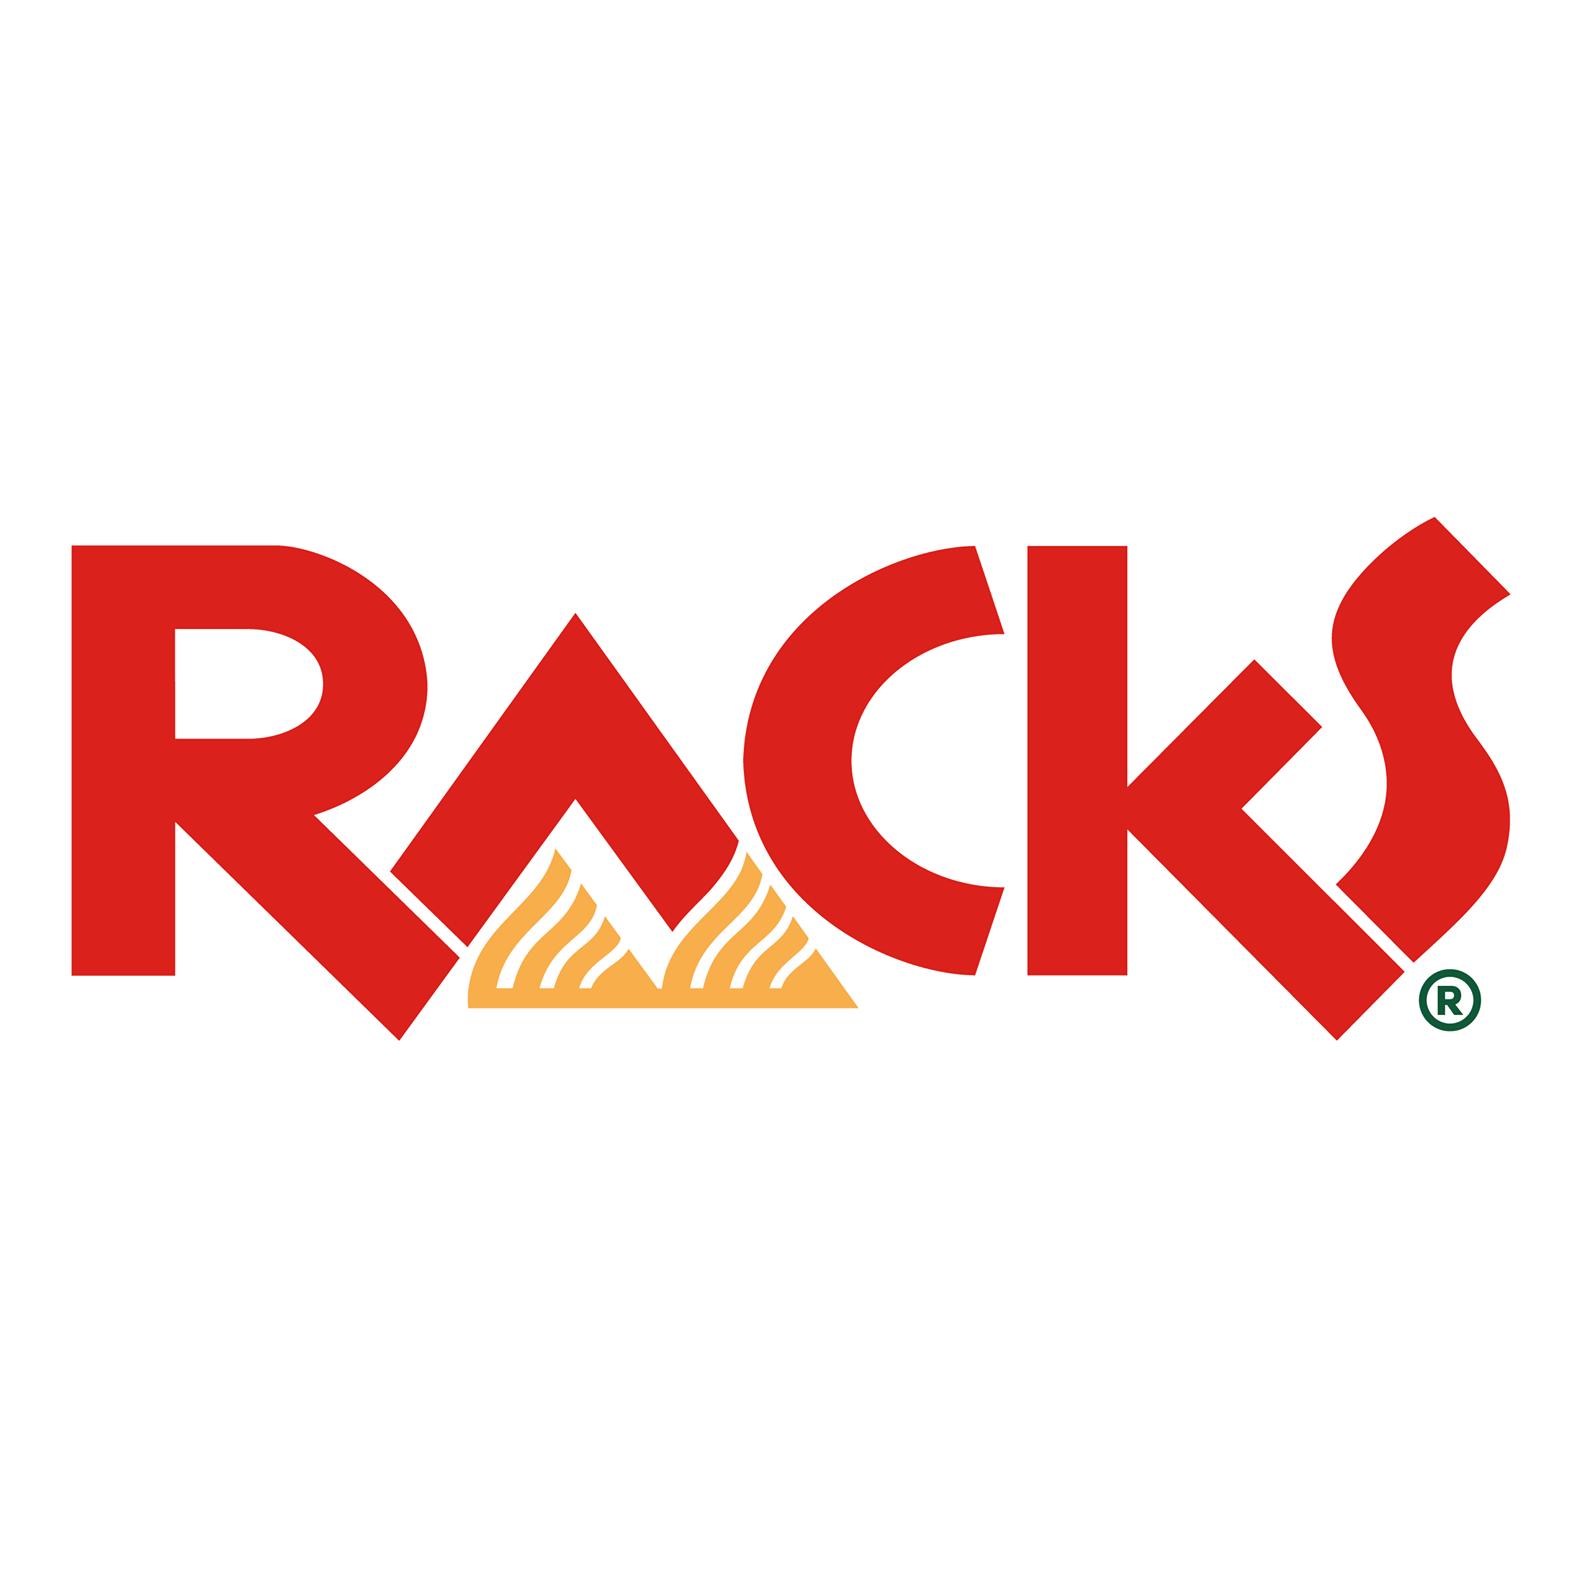 RACKS (Greenhills, San Juan City) City of San Juan